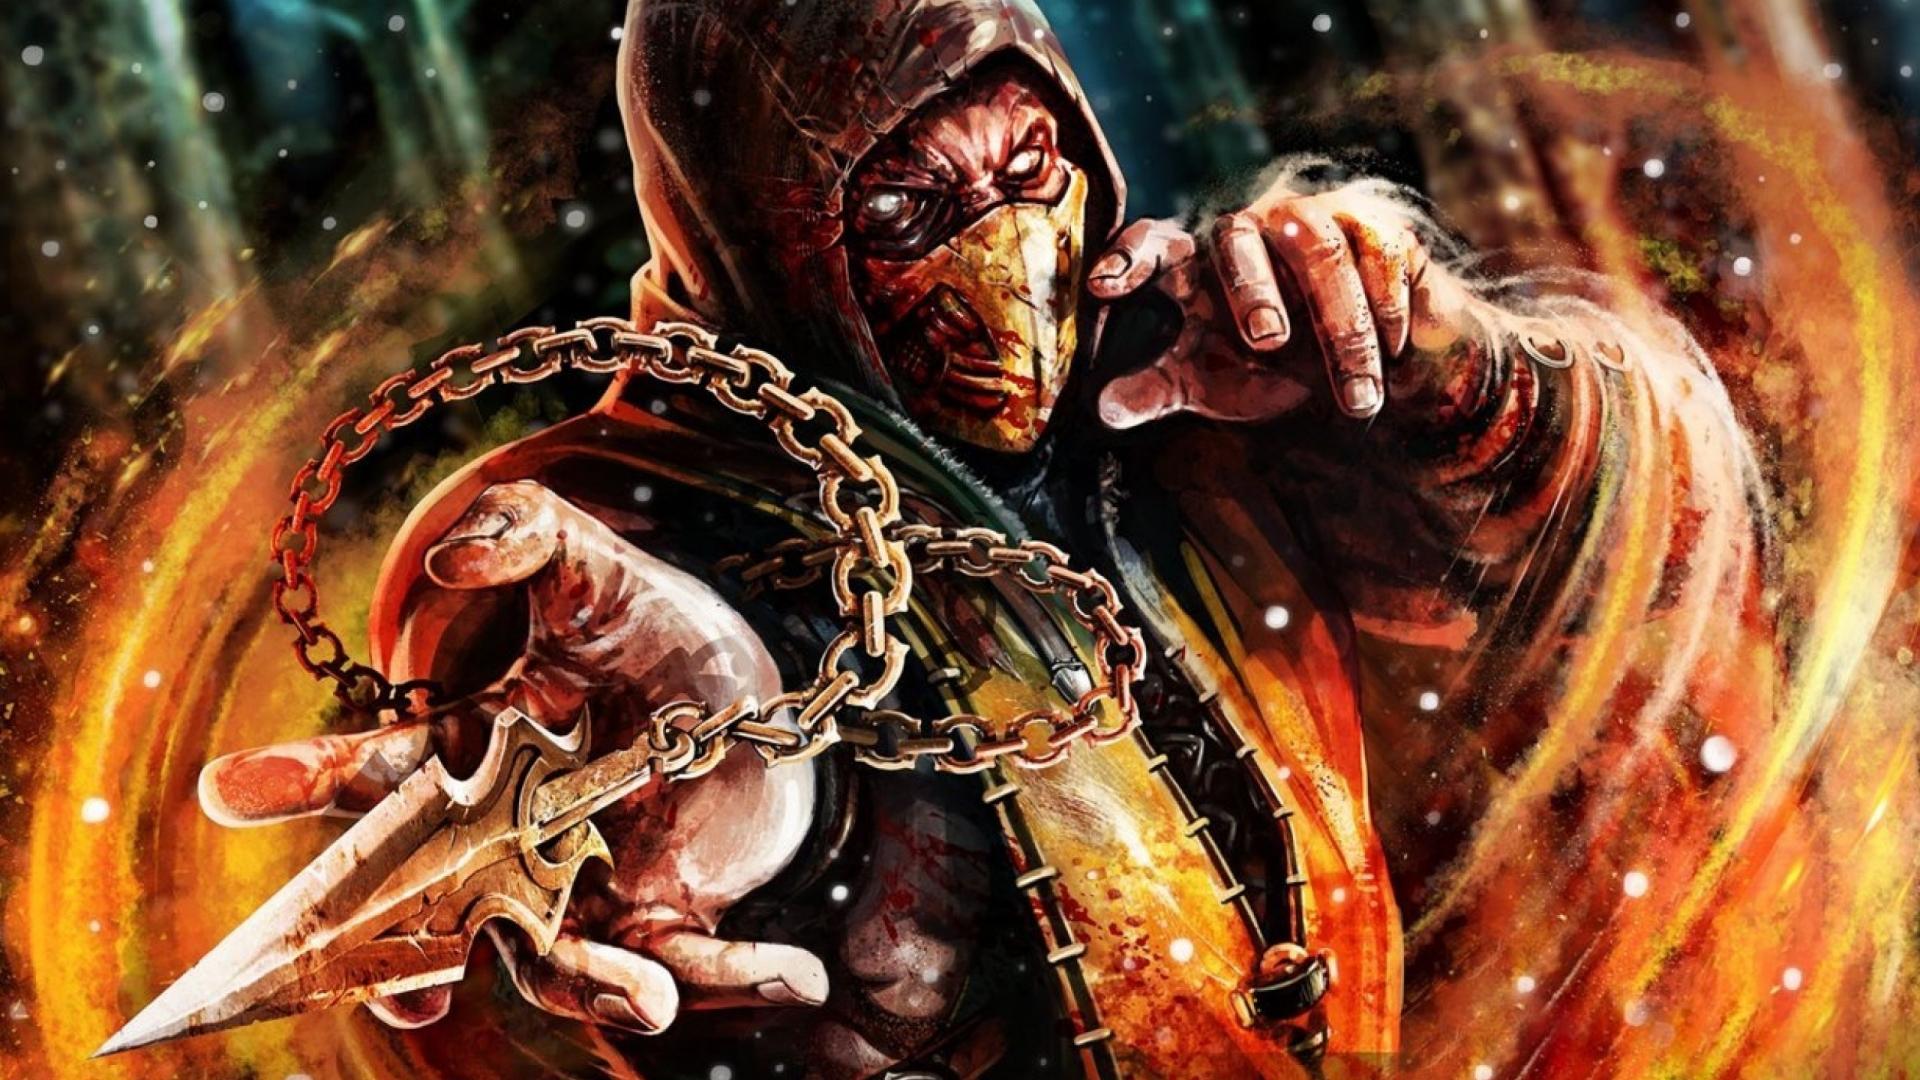 Mortal Kombat X Scorpion Desktop Wallpaper 1920x1080